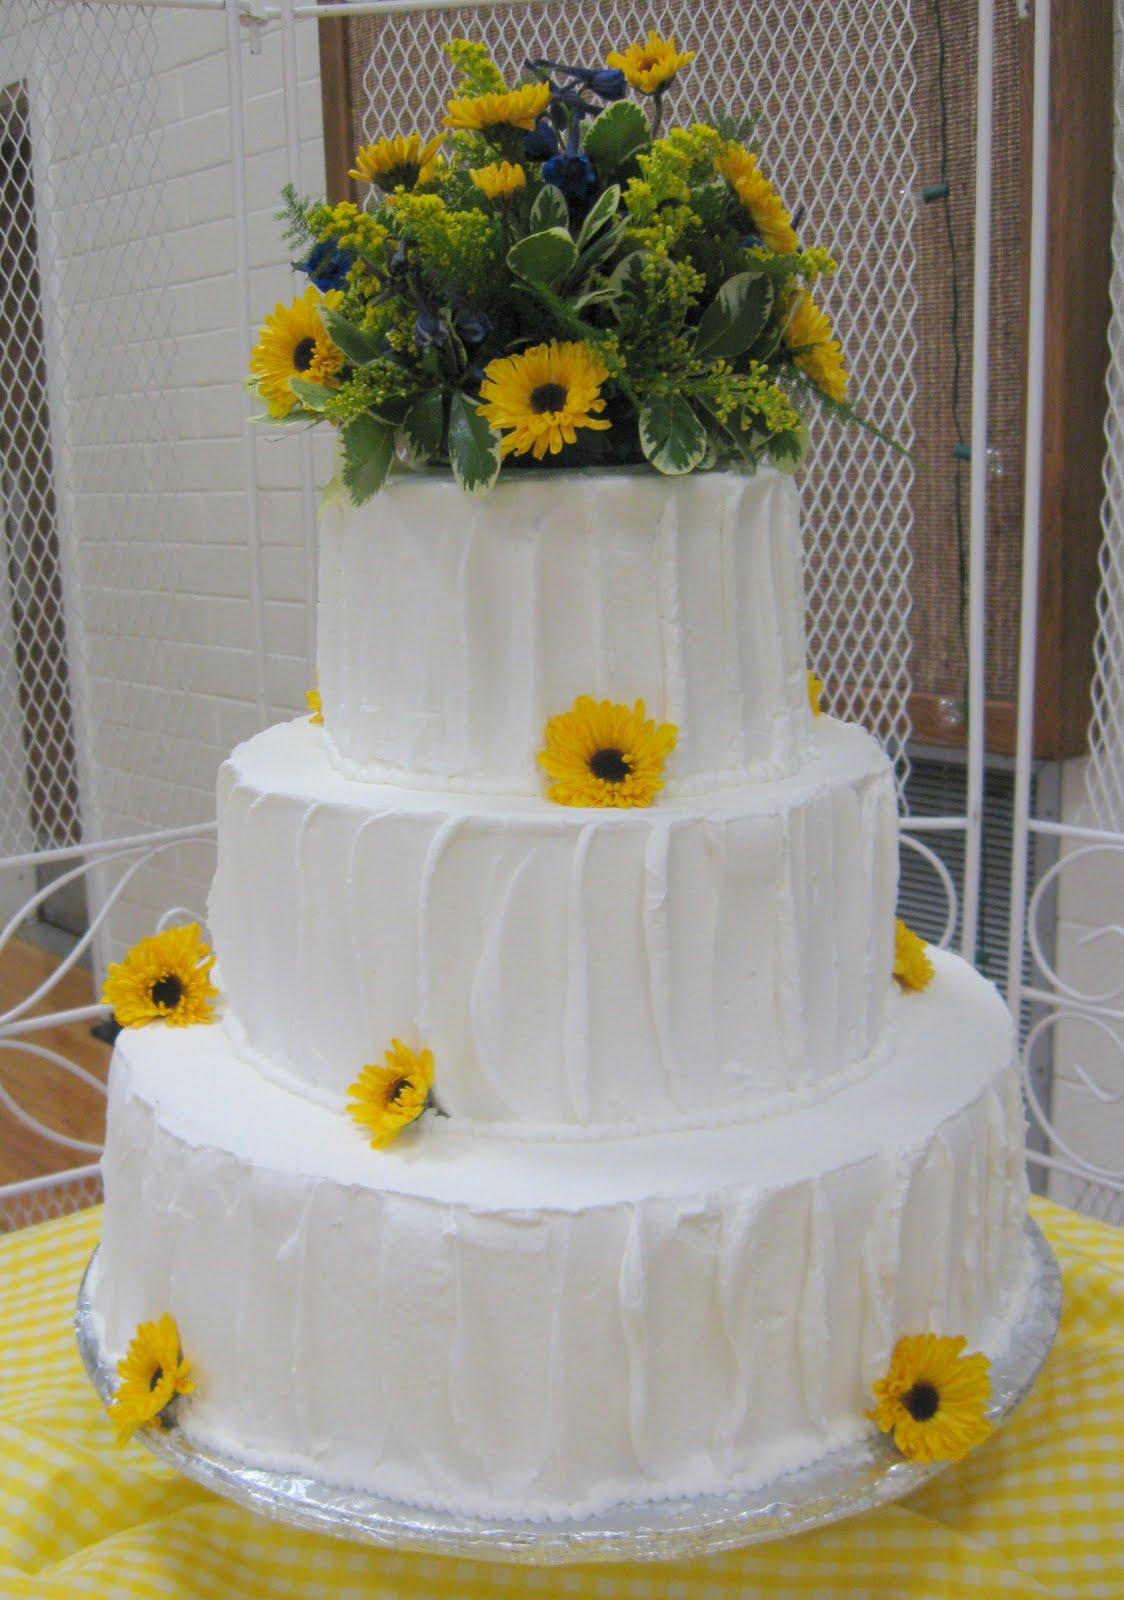 ChubbyHubbyCakes Country style wedding cake